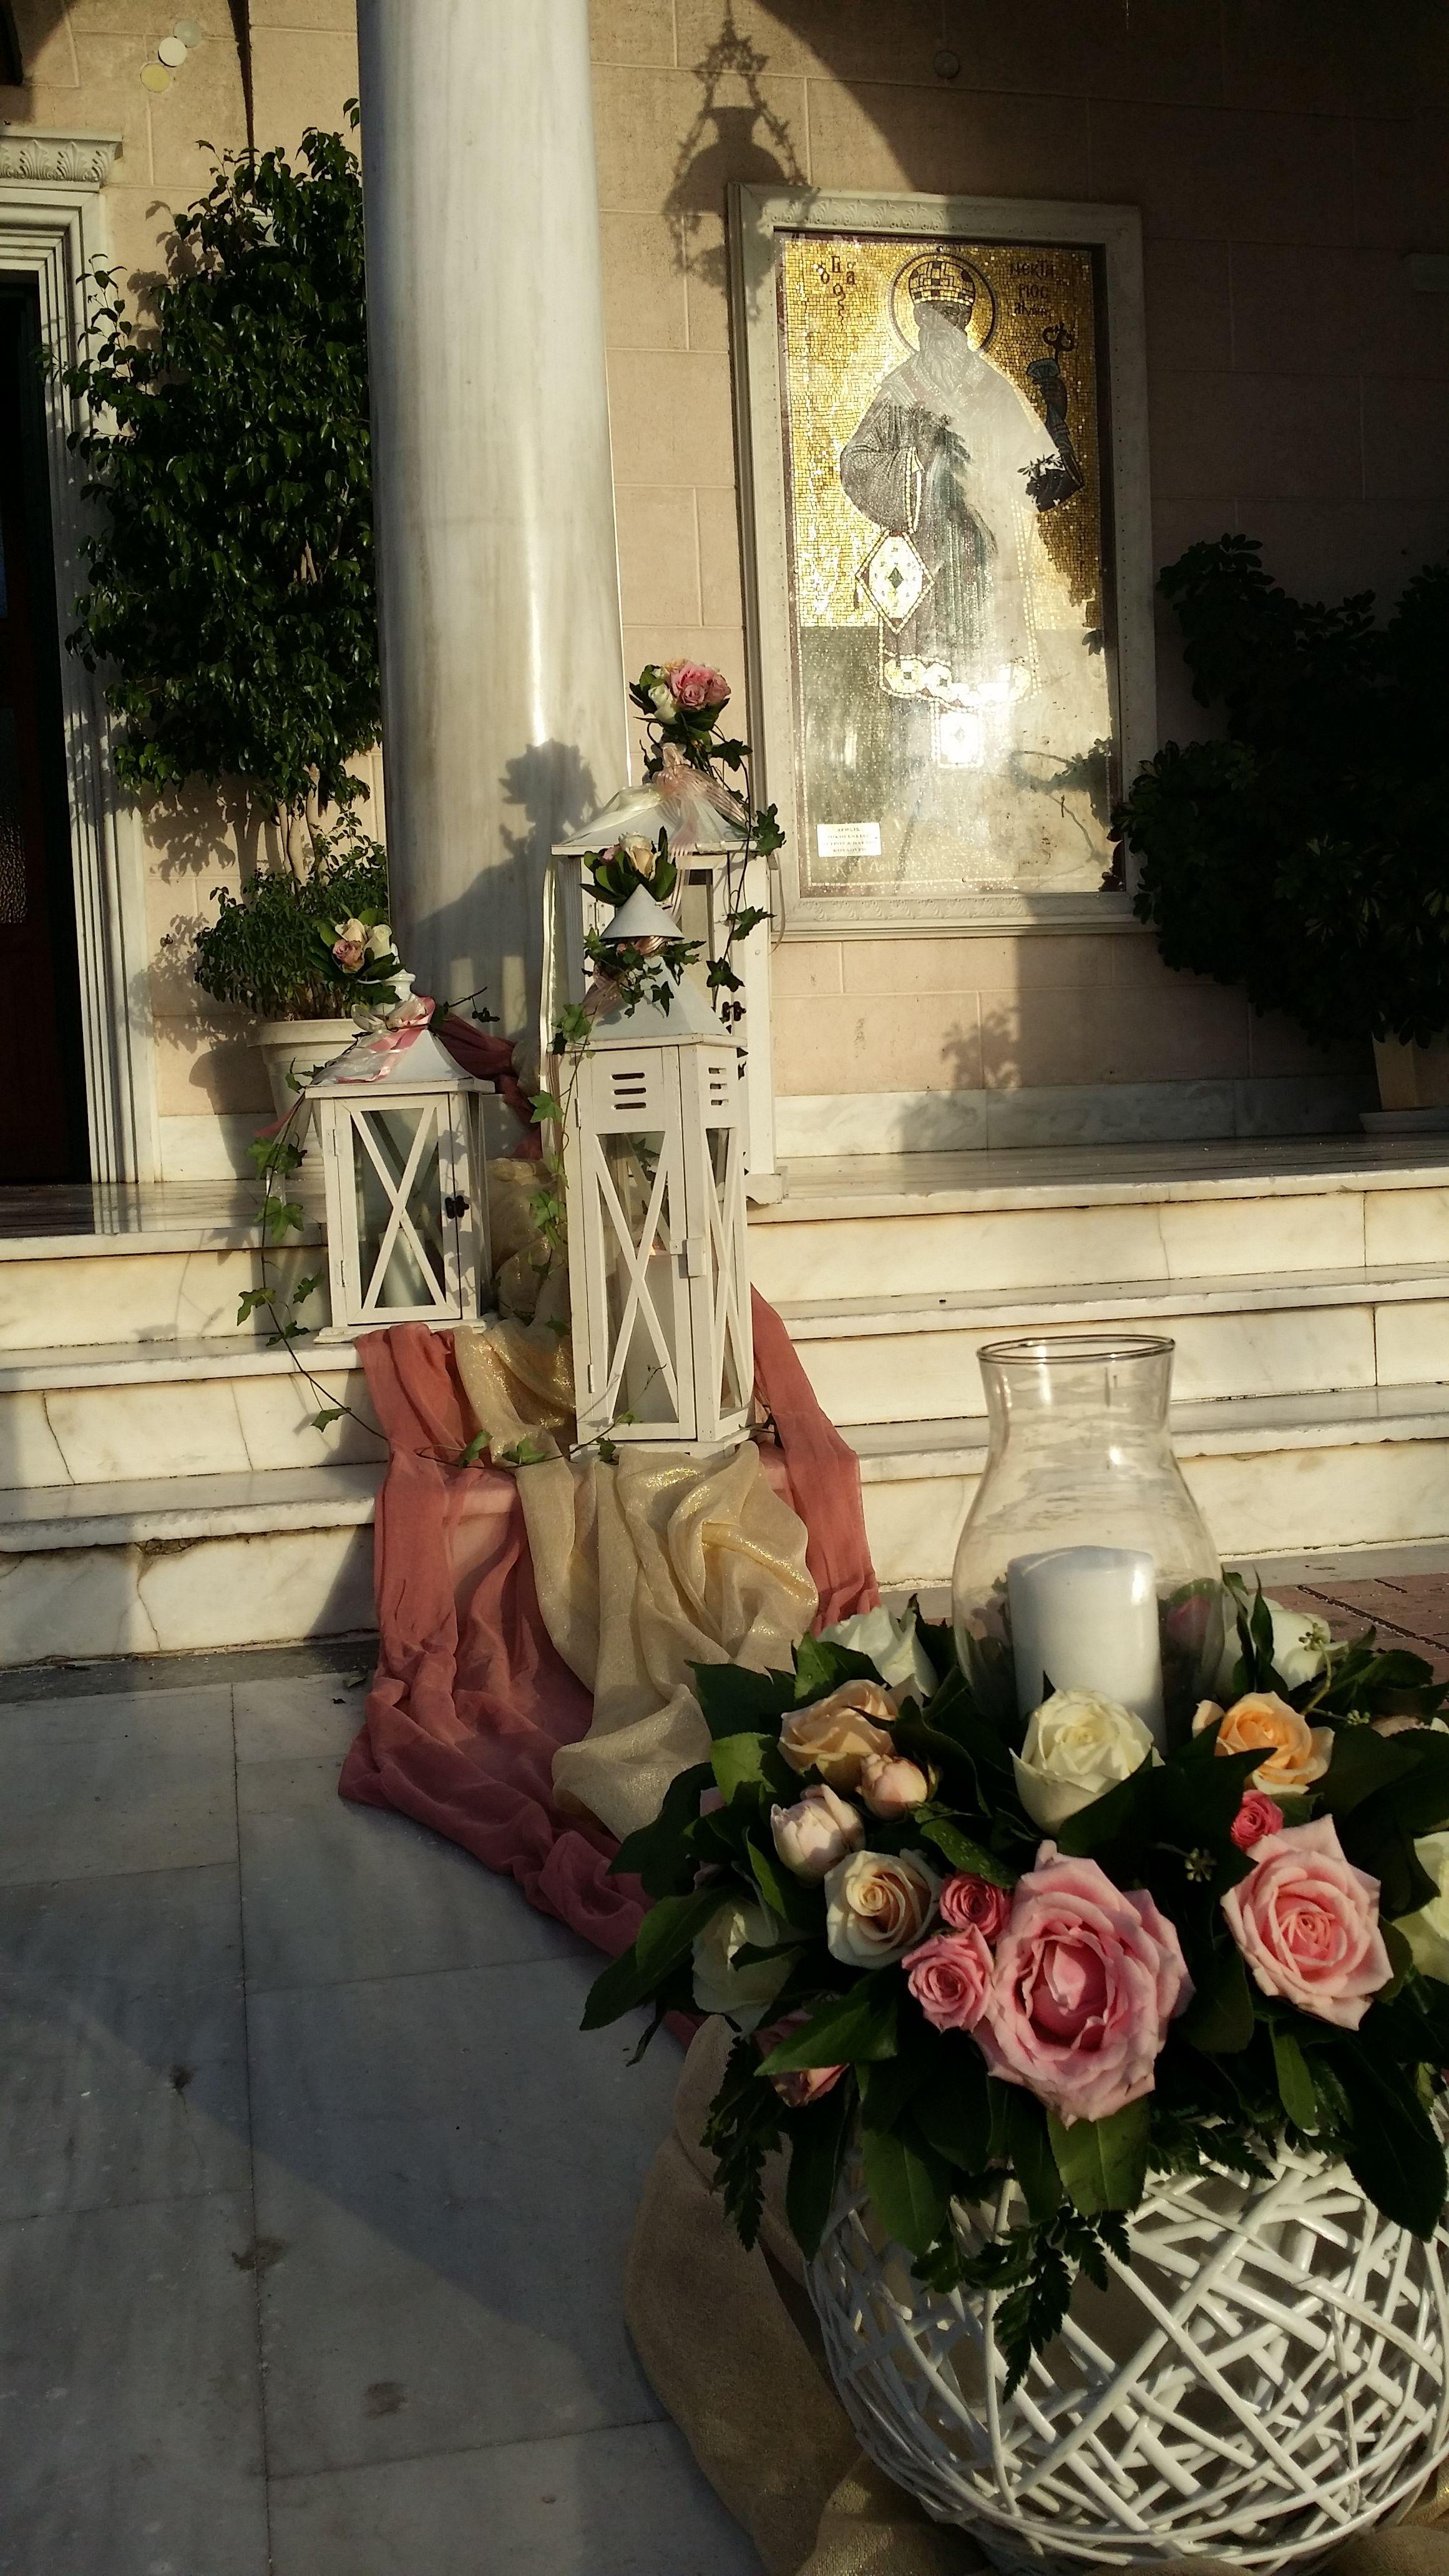 5b99c35a018e Ο εξωτερικός στολισμός του γάμου σας στην εκκλησία περιλαμβάνει  τριαντάφυλλα